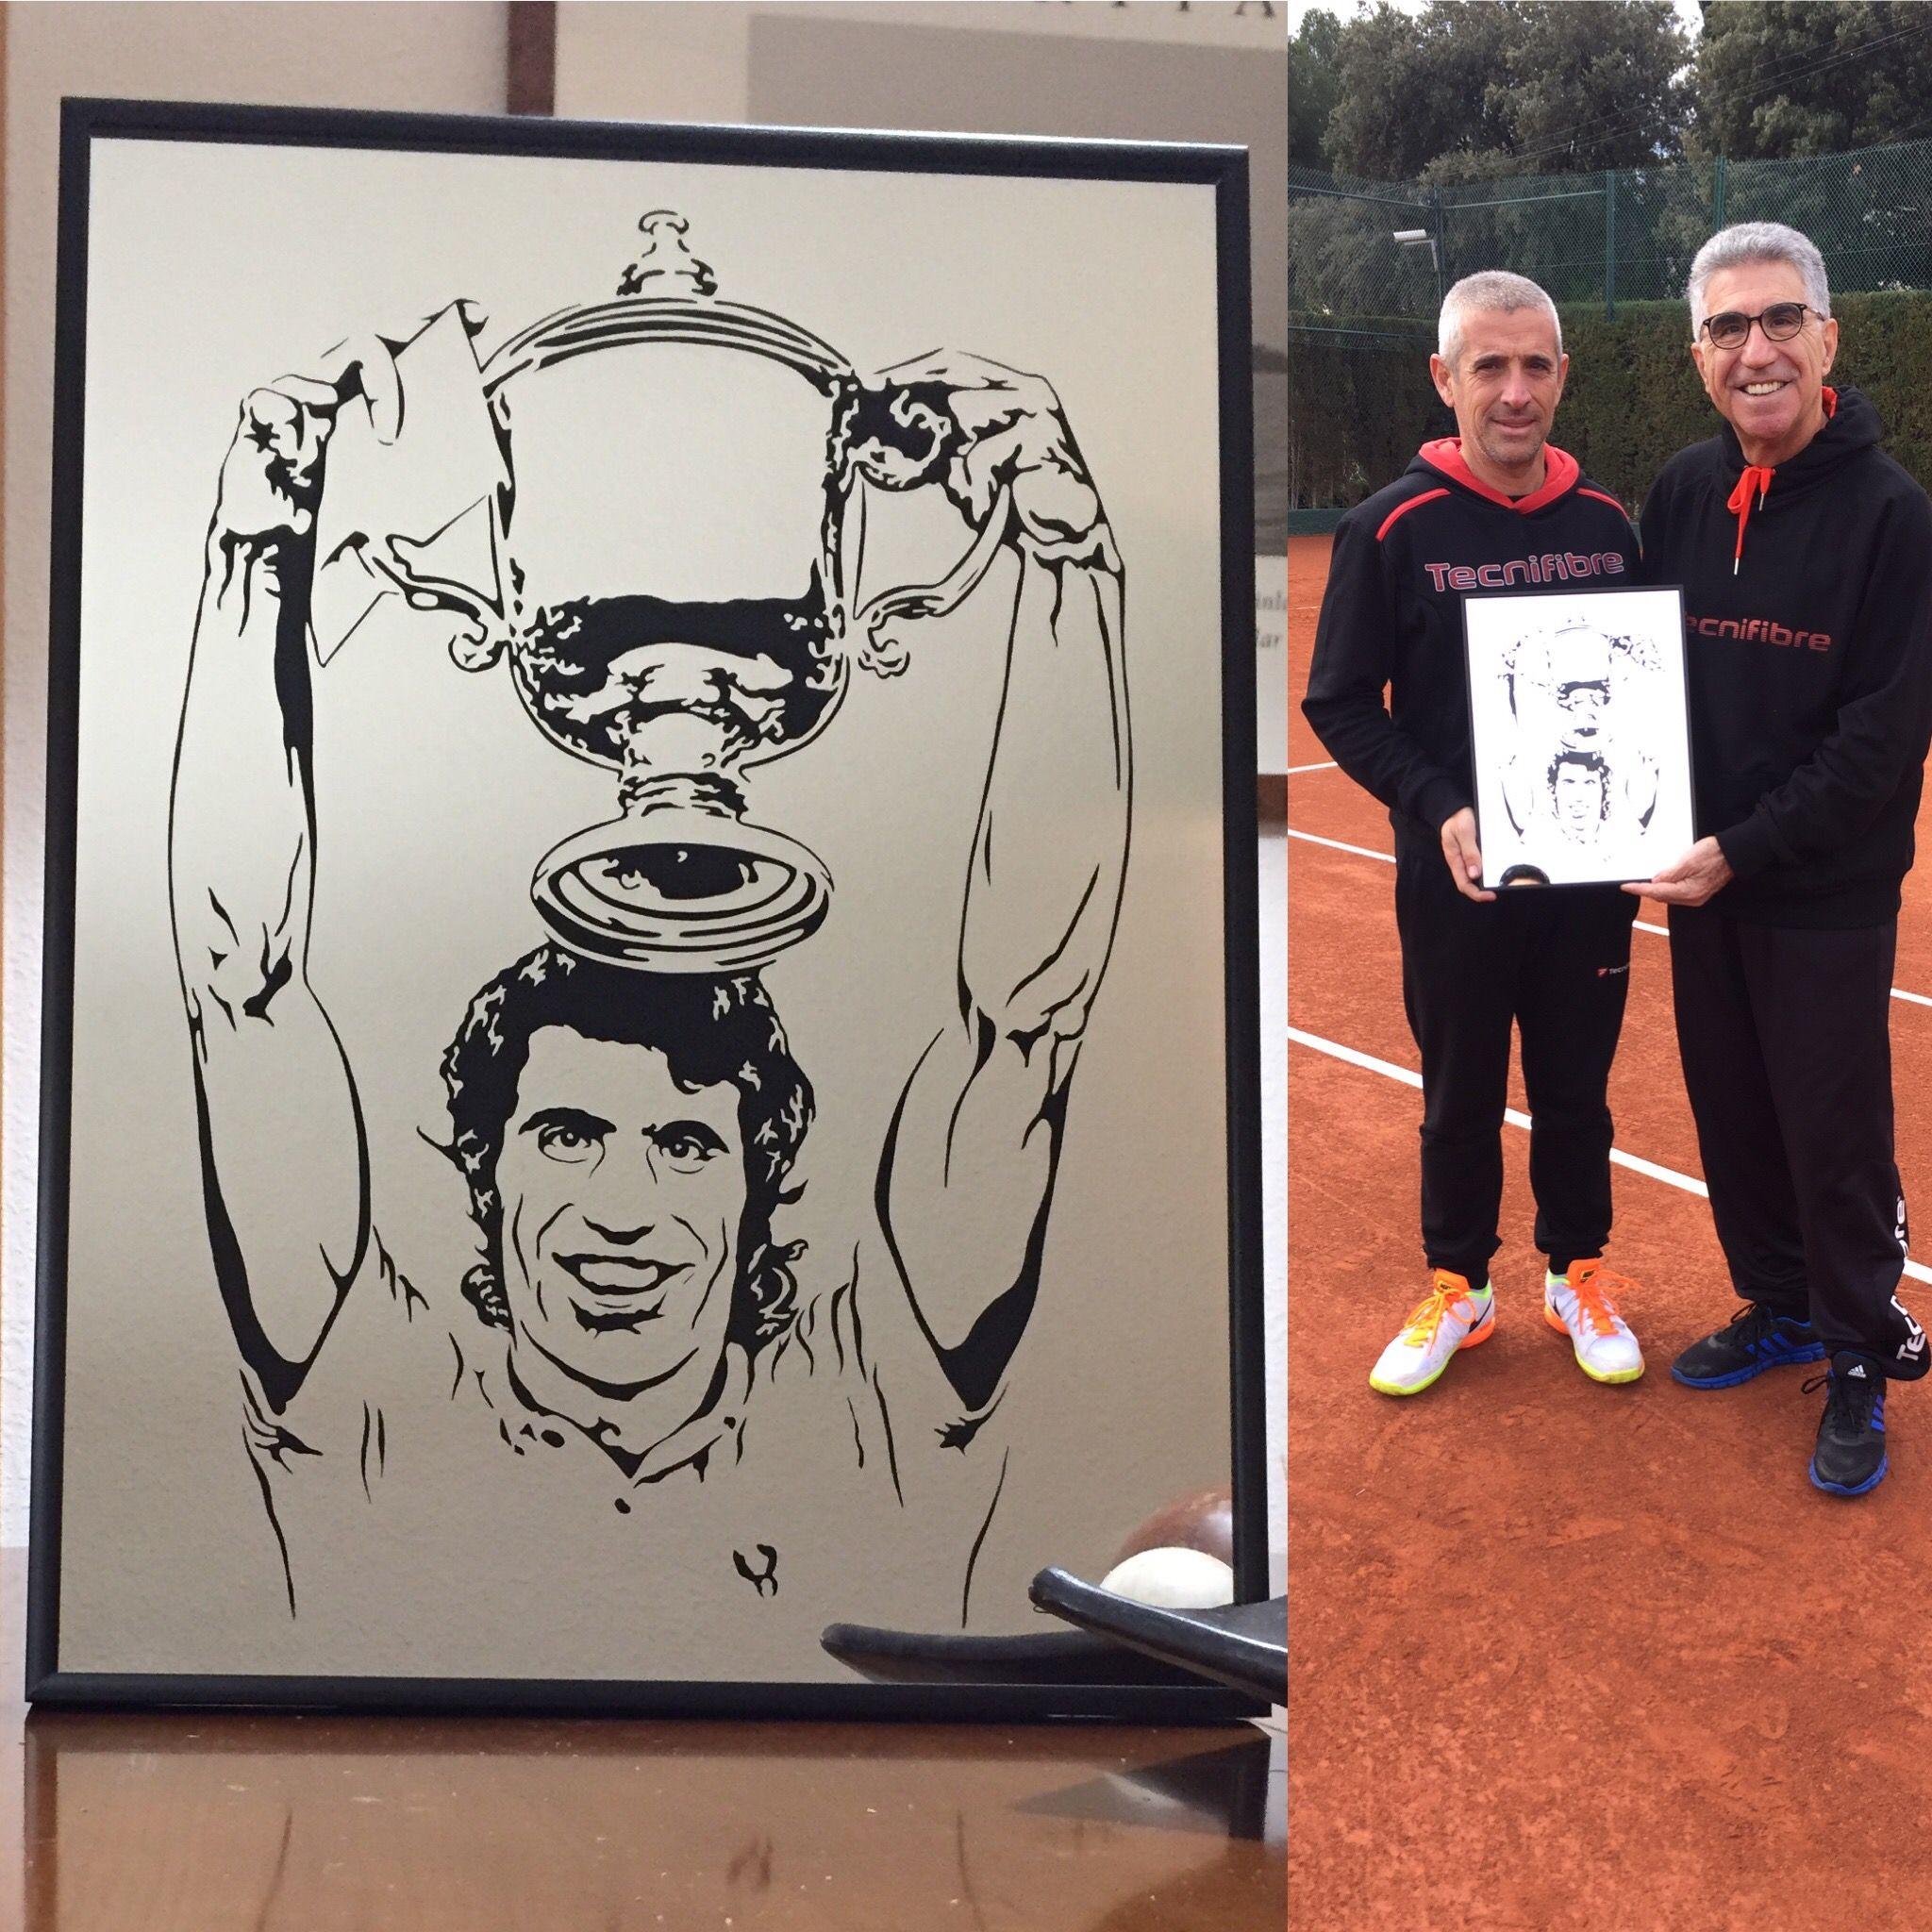 Manuel Orantes Tennis Hall of Famers Pinterest